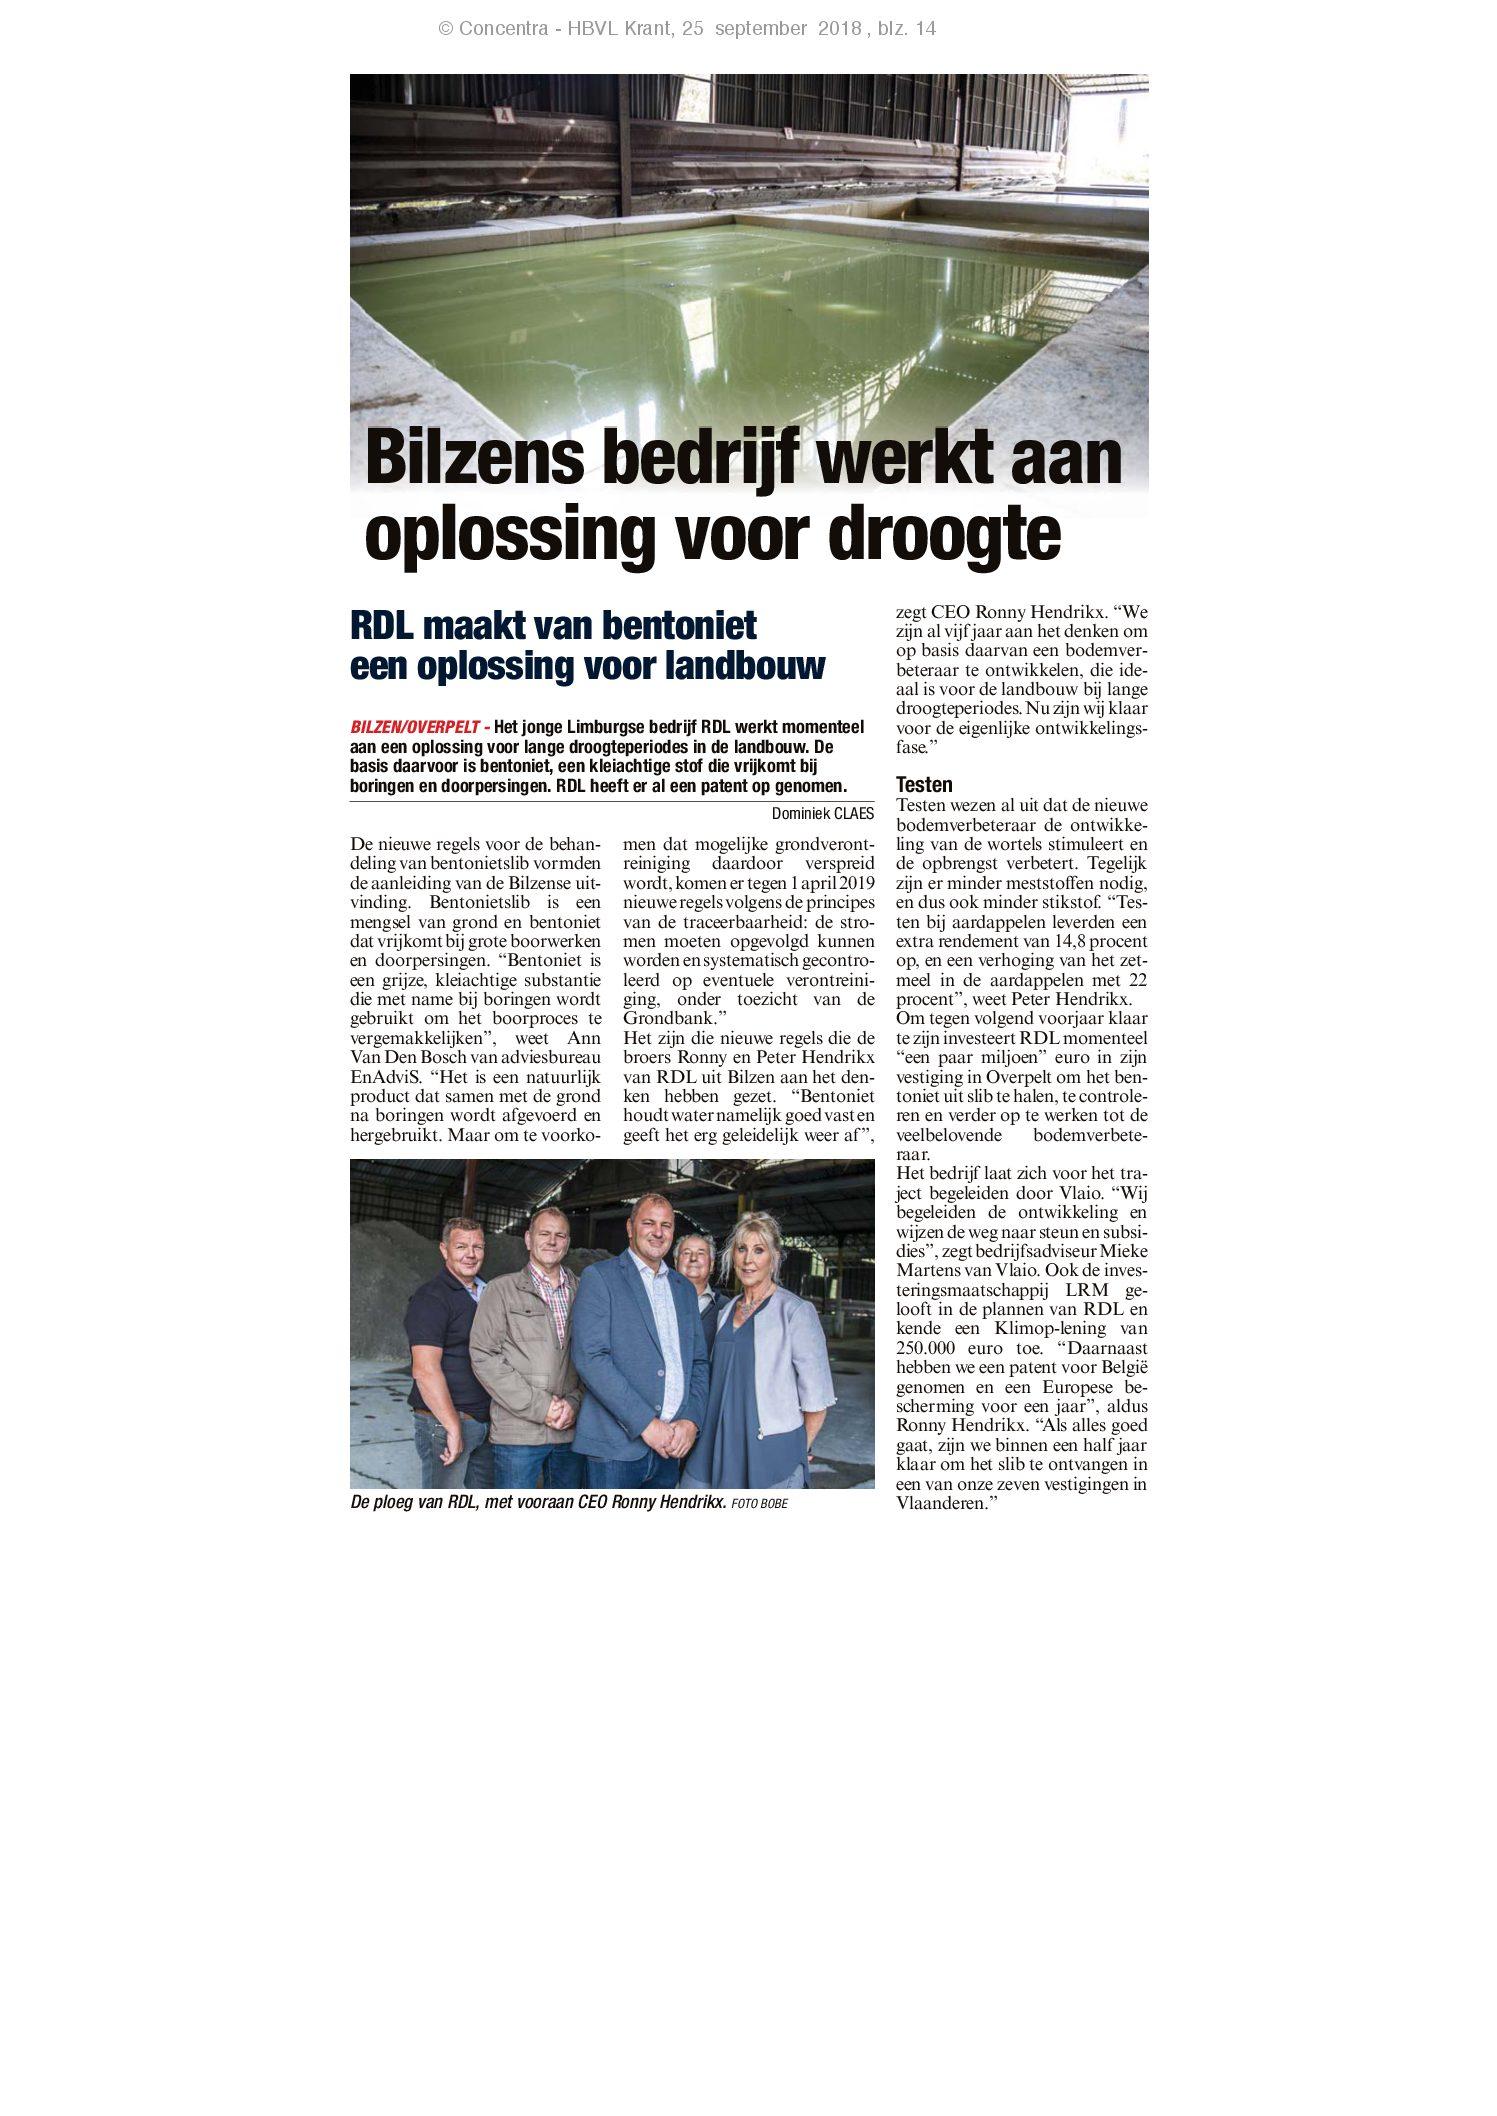 Concentra-HBVL krant 25 september 2018 - blz 4-RDL-bvba©